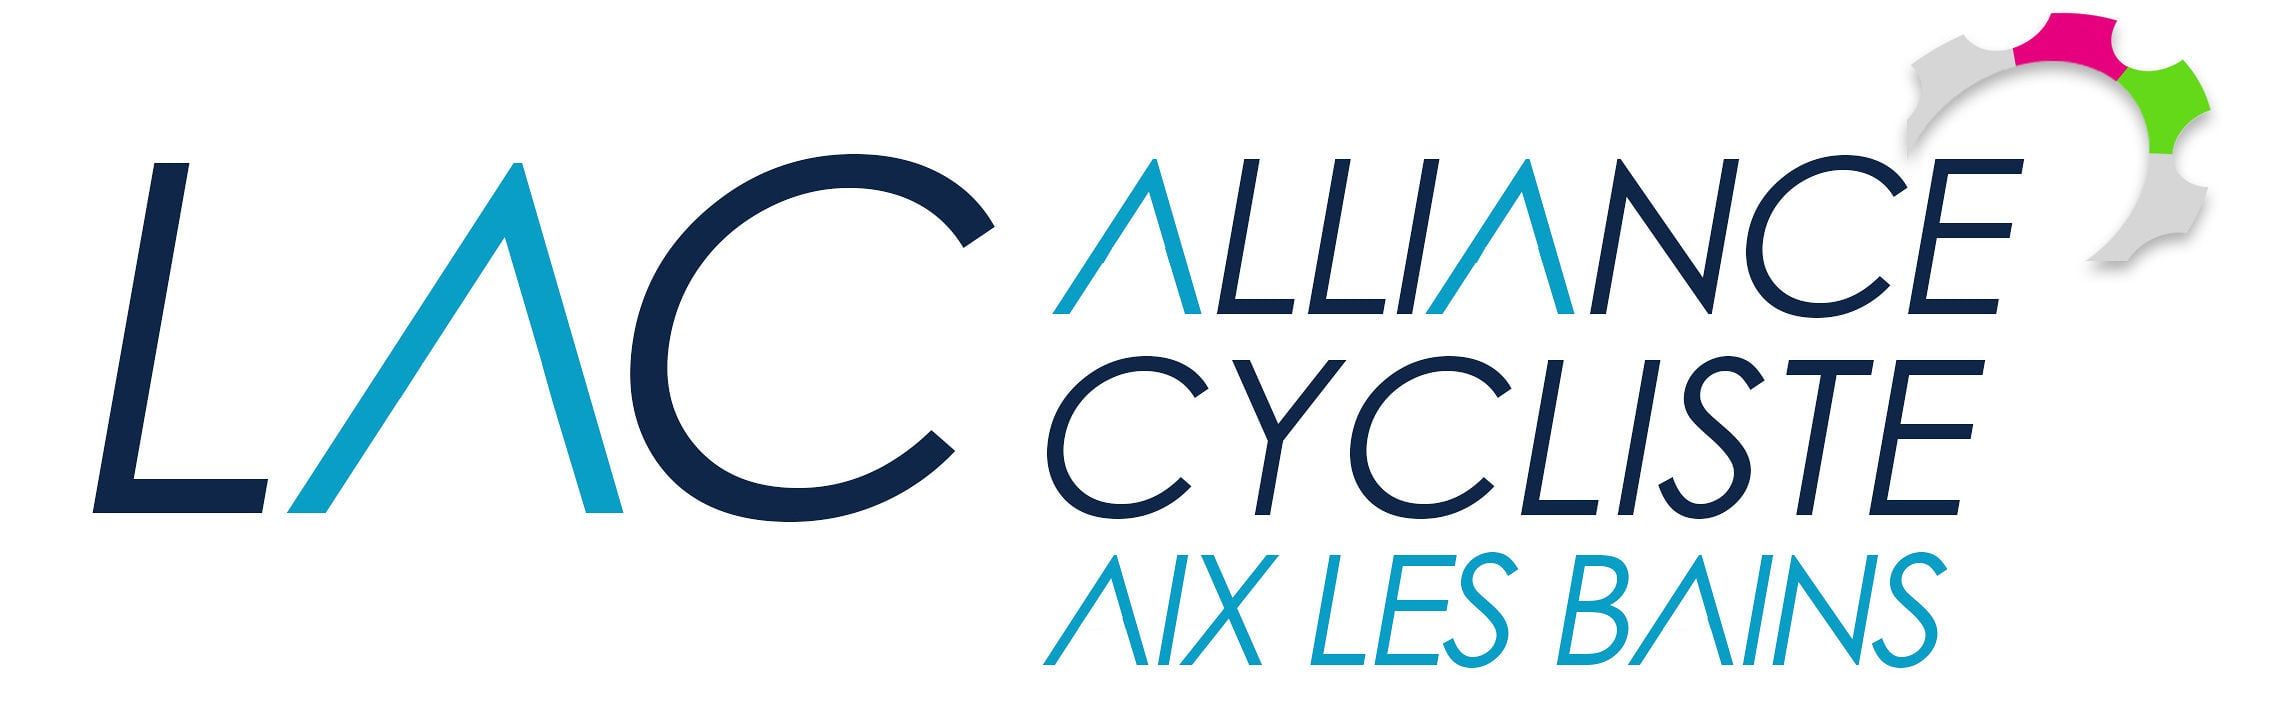 Lac-alliance-cycliste